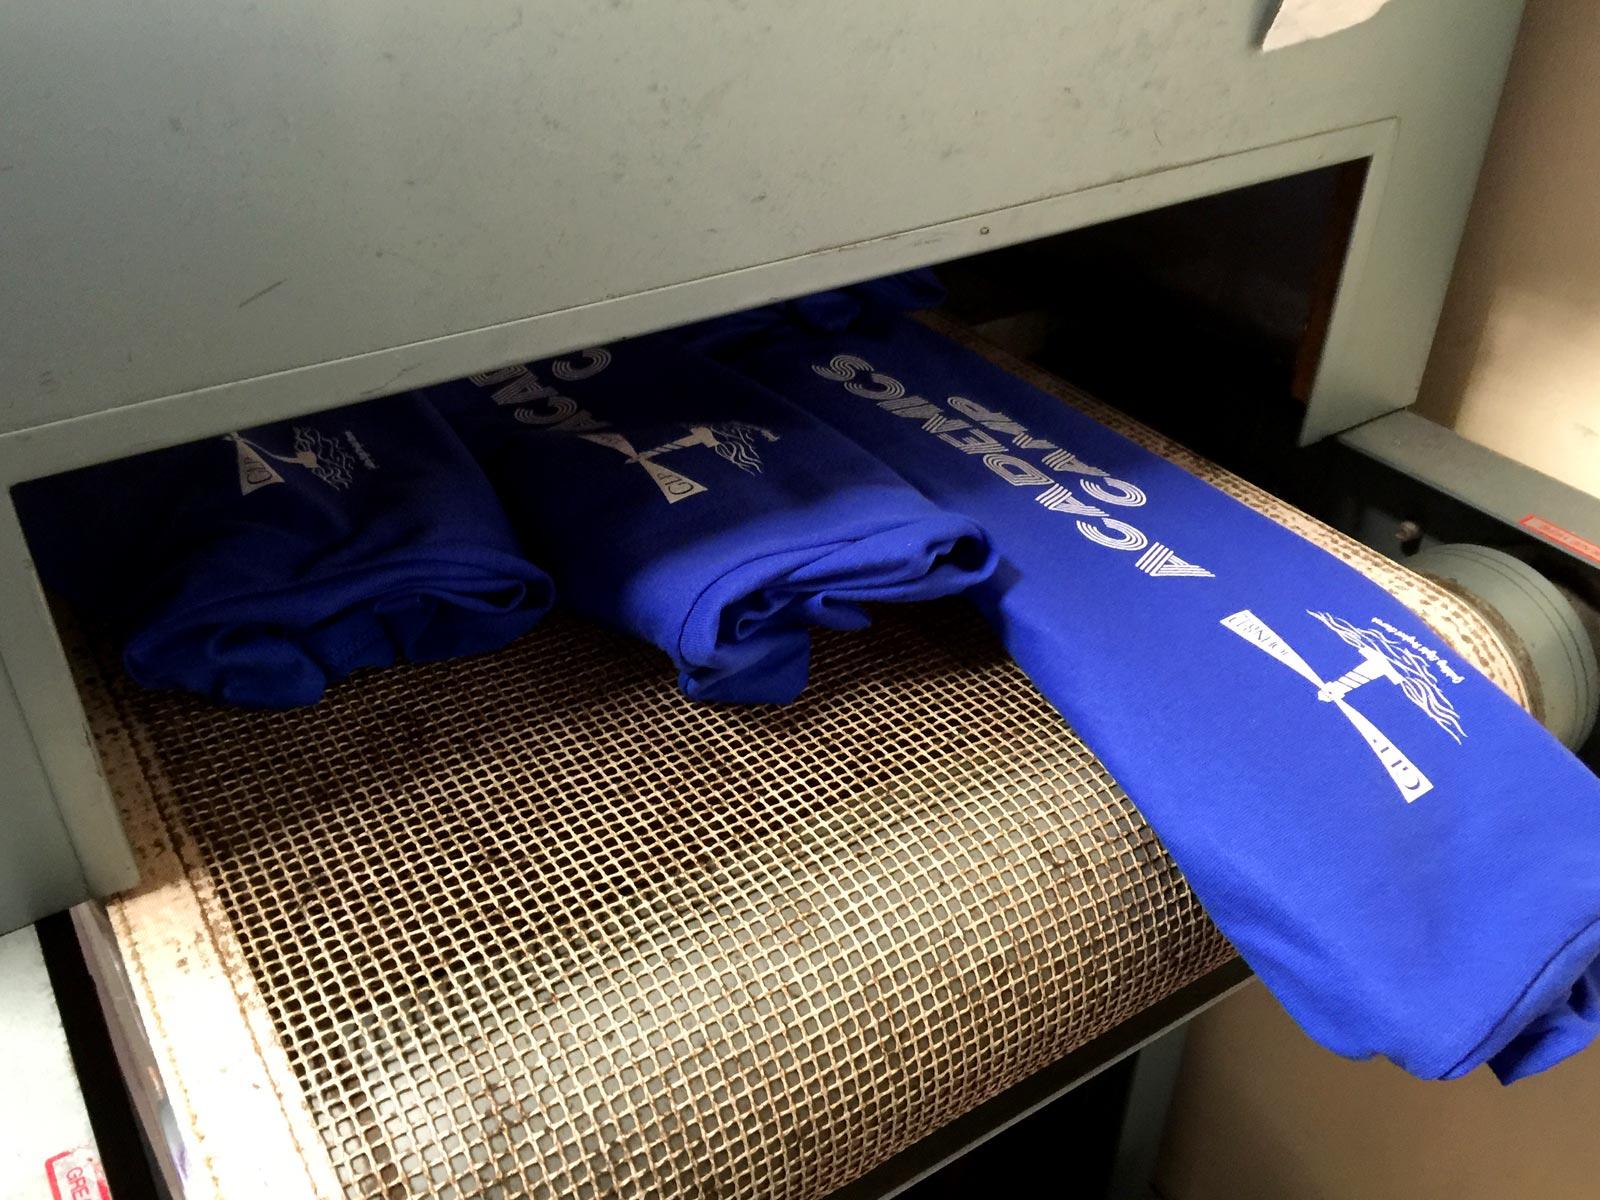 Running the shirts through the dryer.